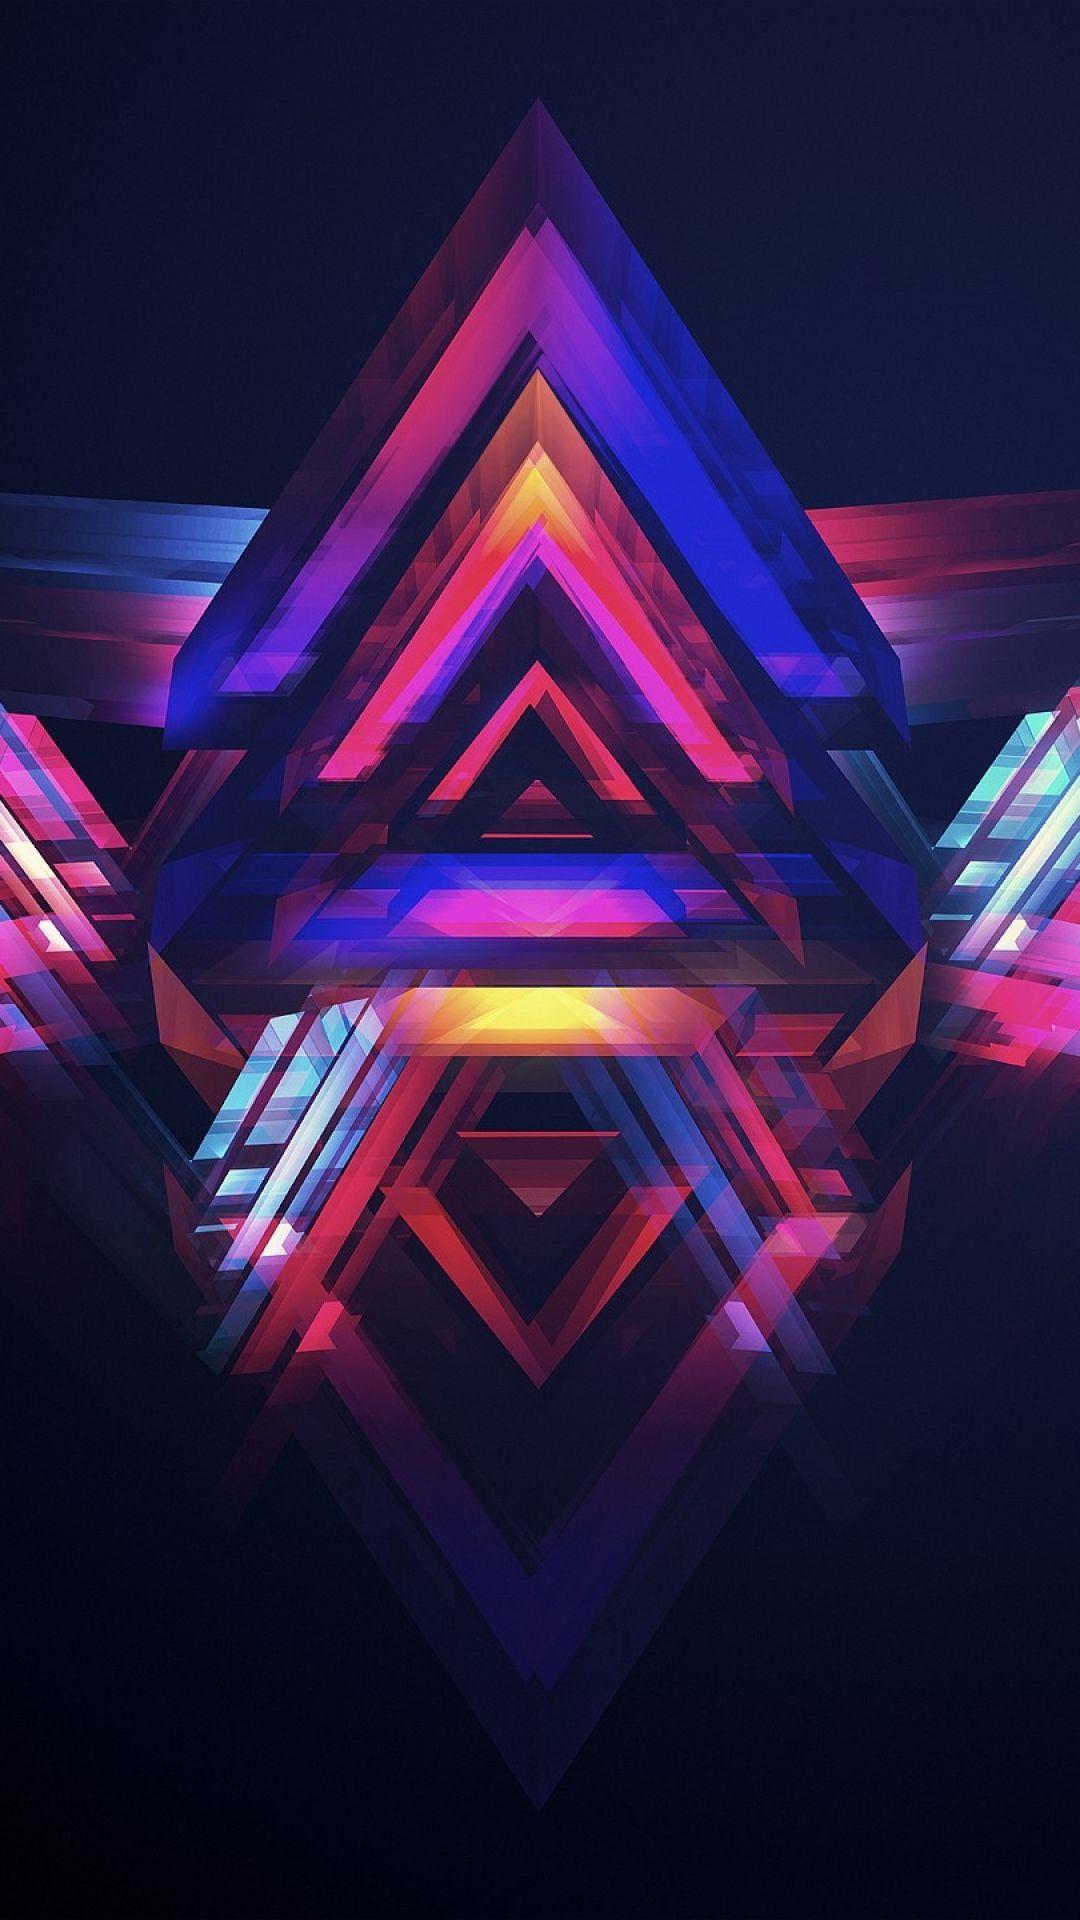 triangle phone wallpaper s5 phone wallpaper